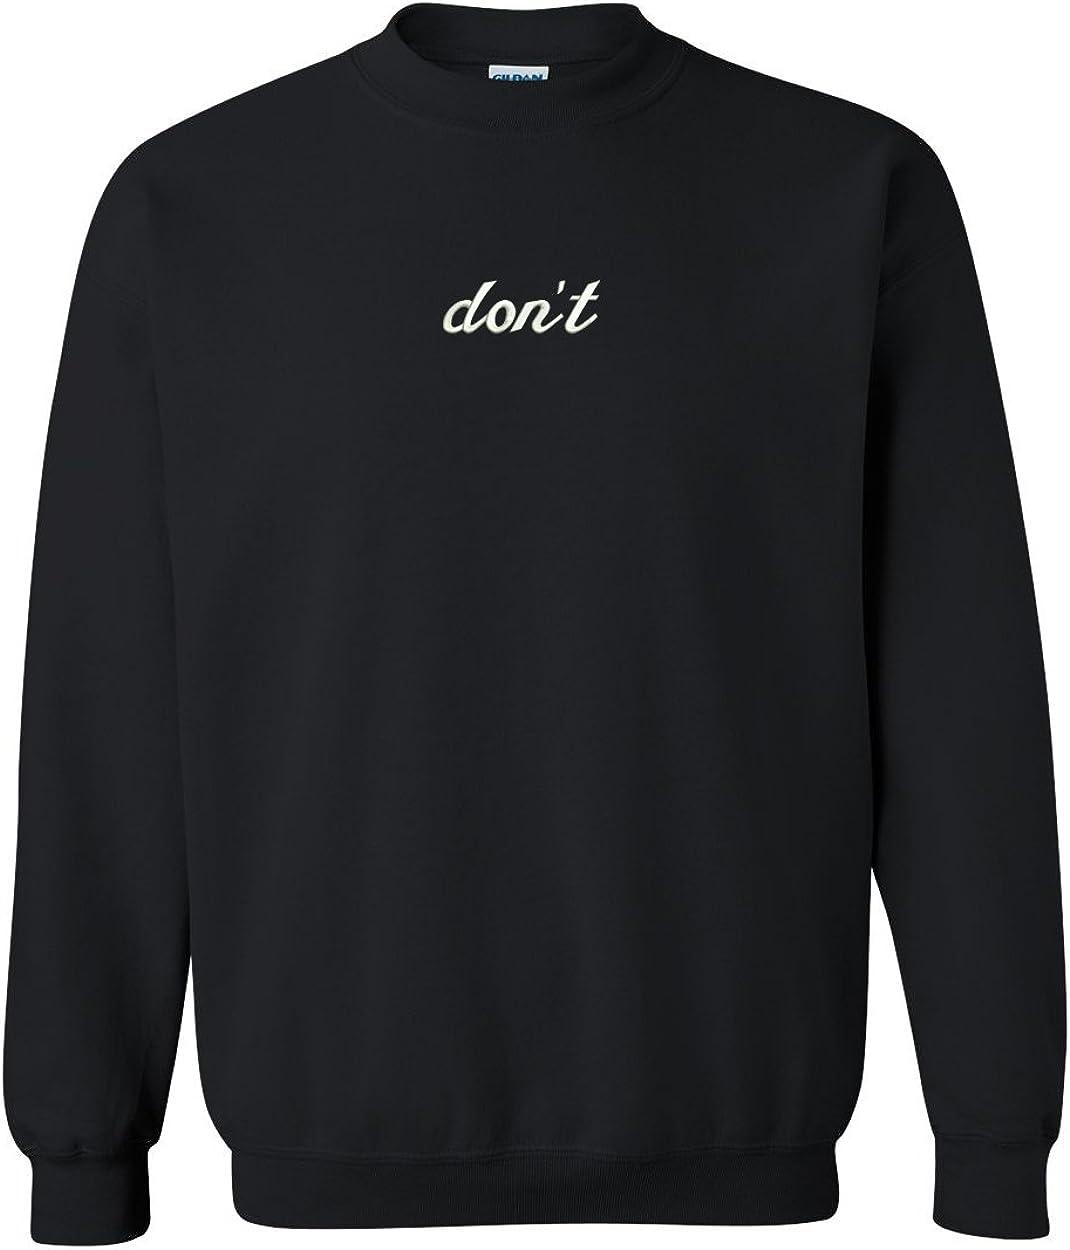 Trendy Apparel Shop Embroidered Crewneck Sweatshirt